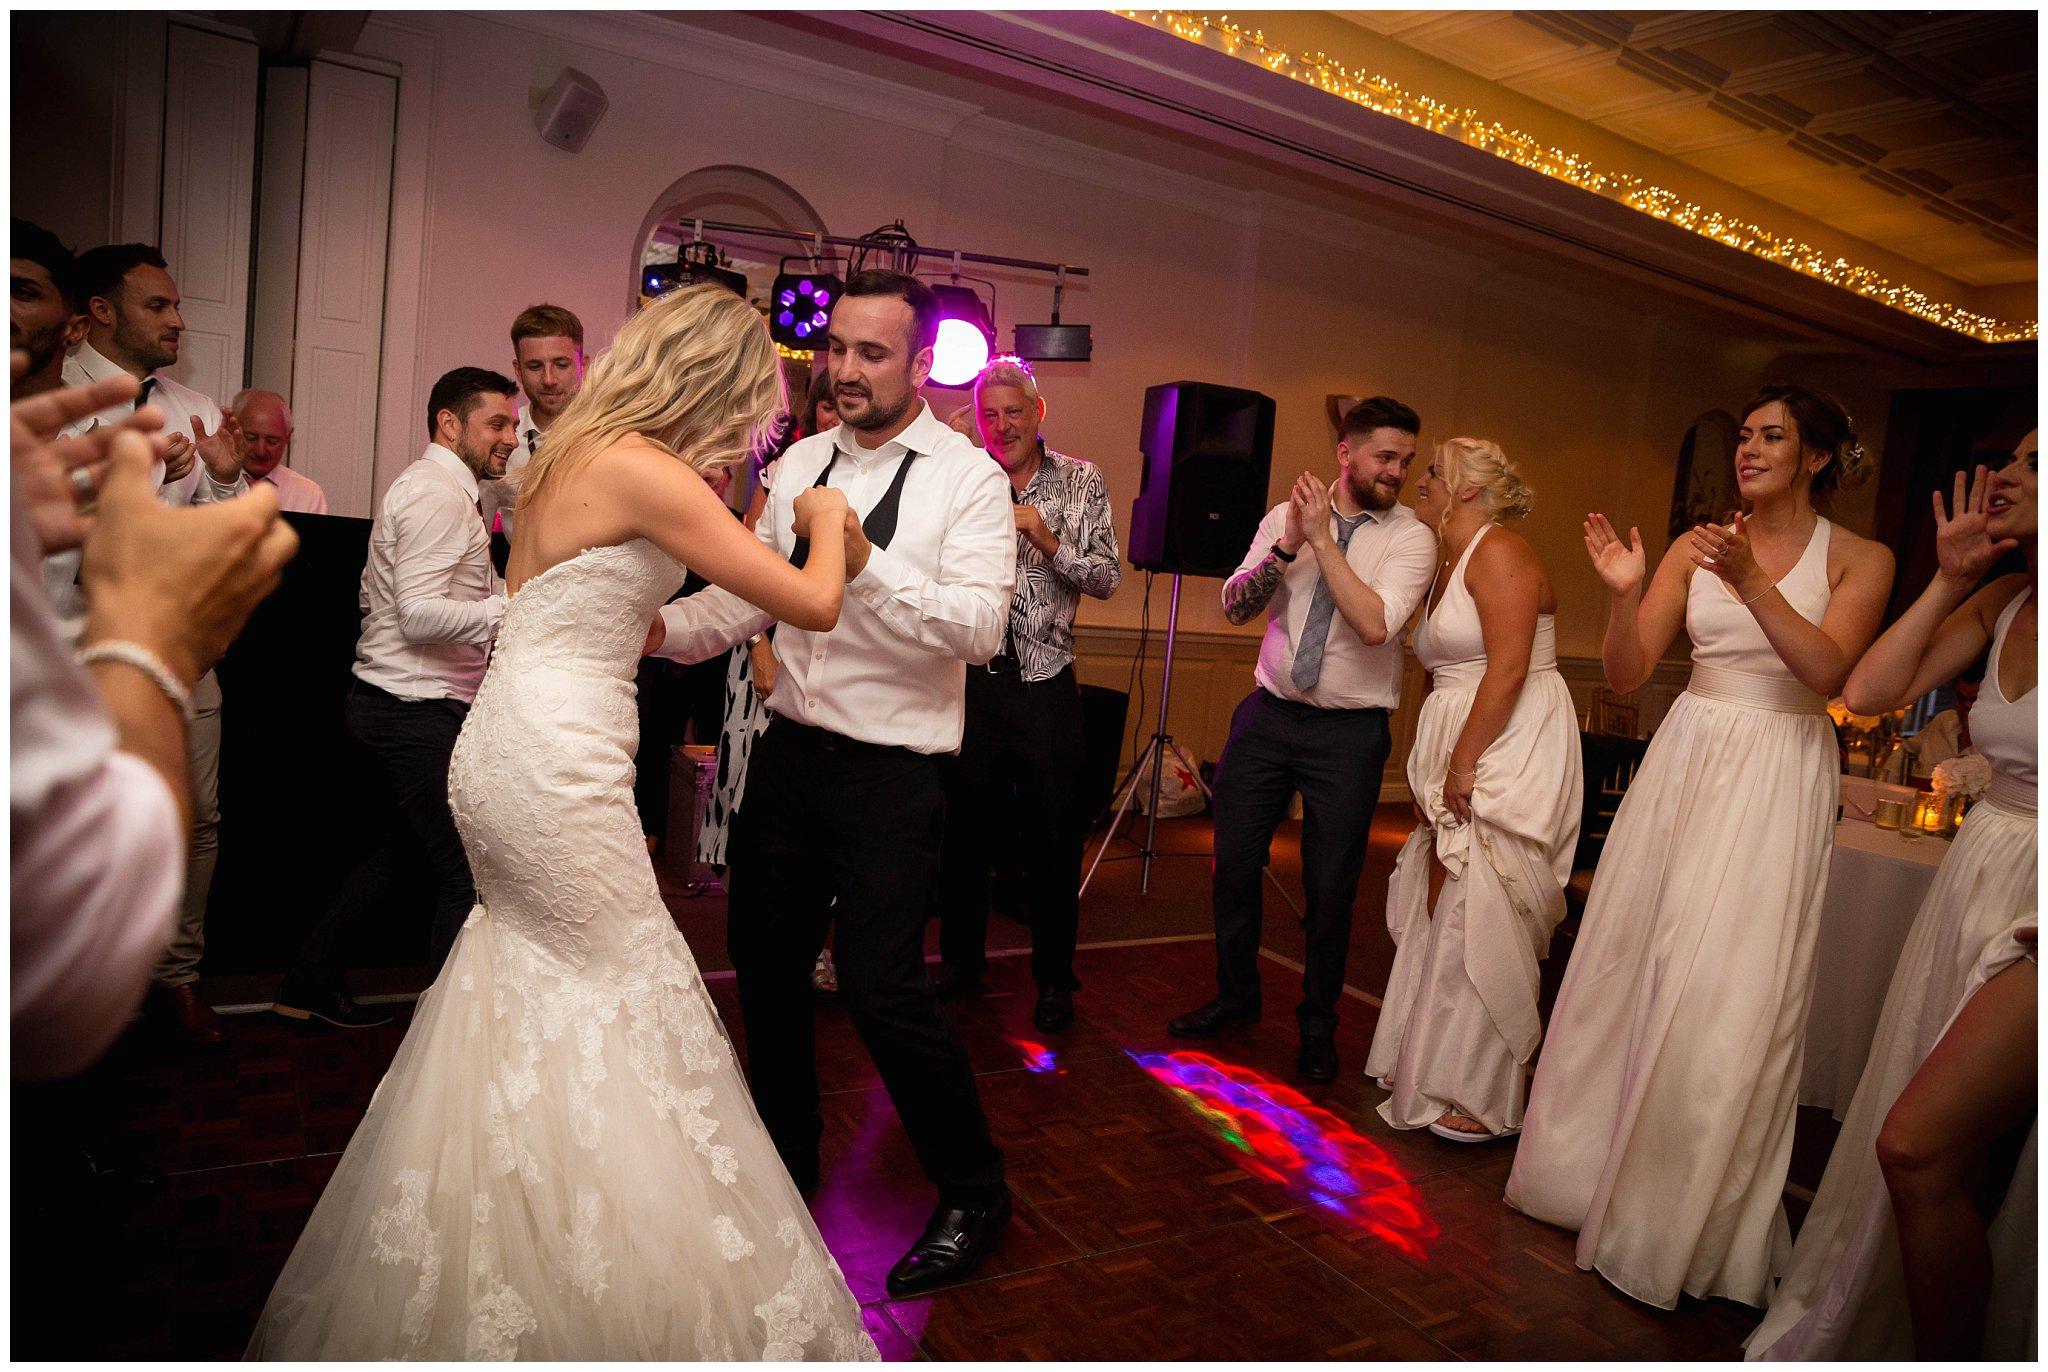 Orangery wedding venues maidstone